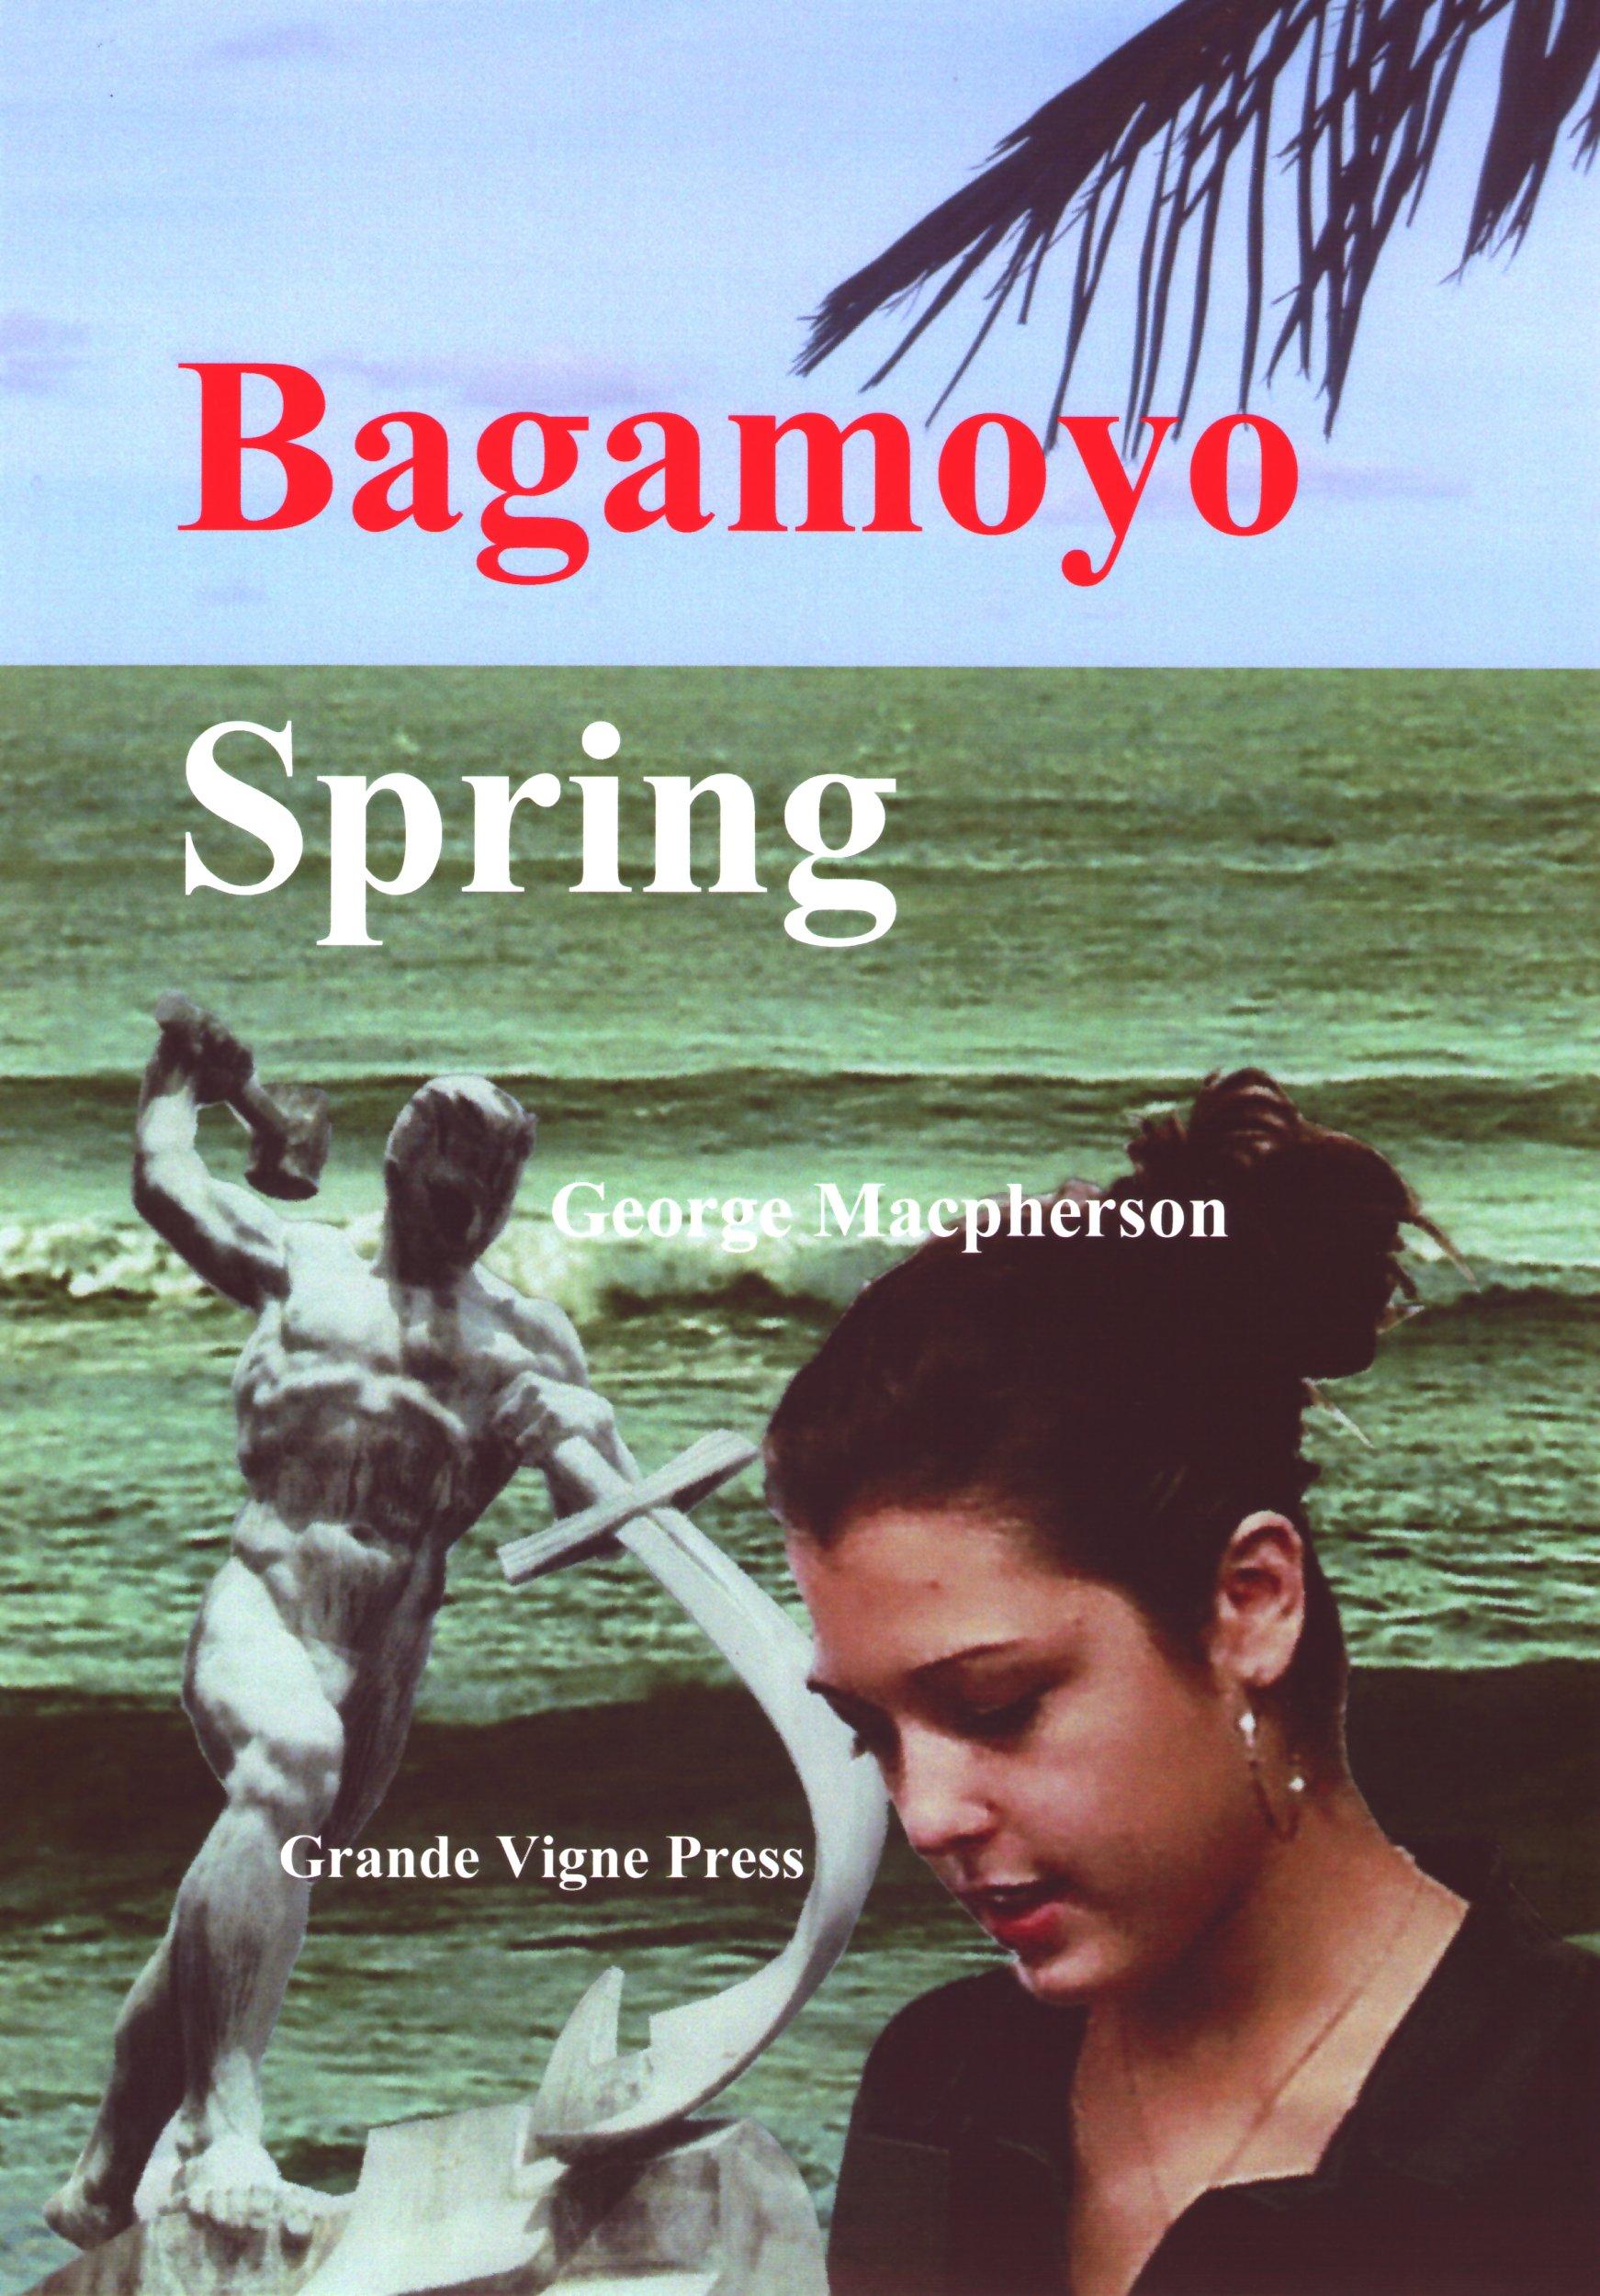 Bagamoyo Spring